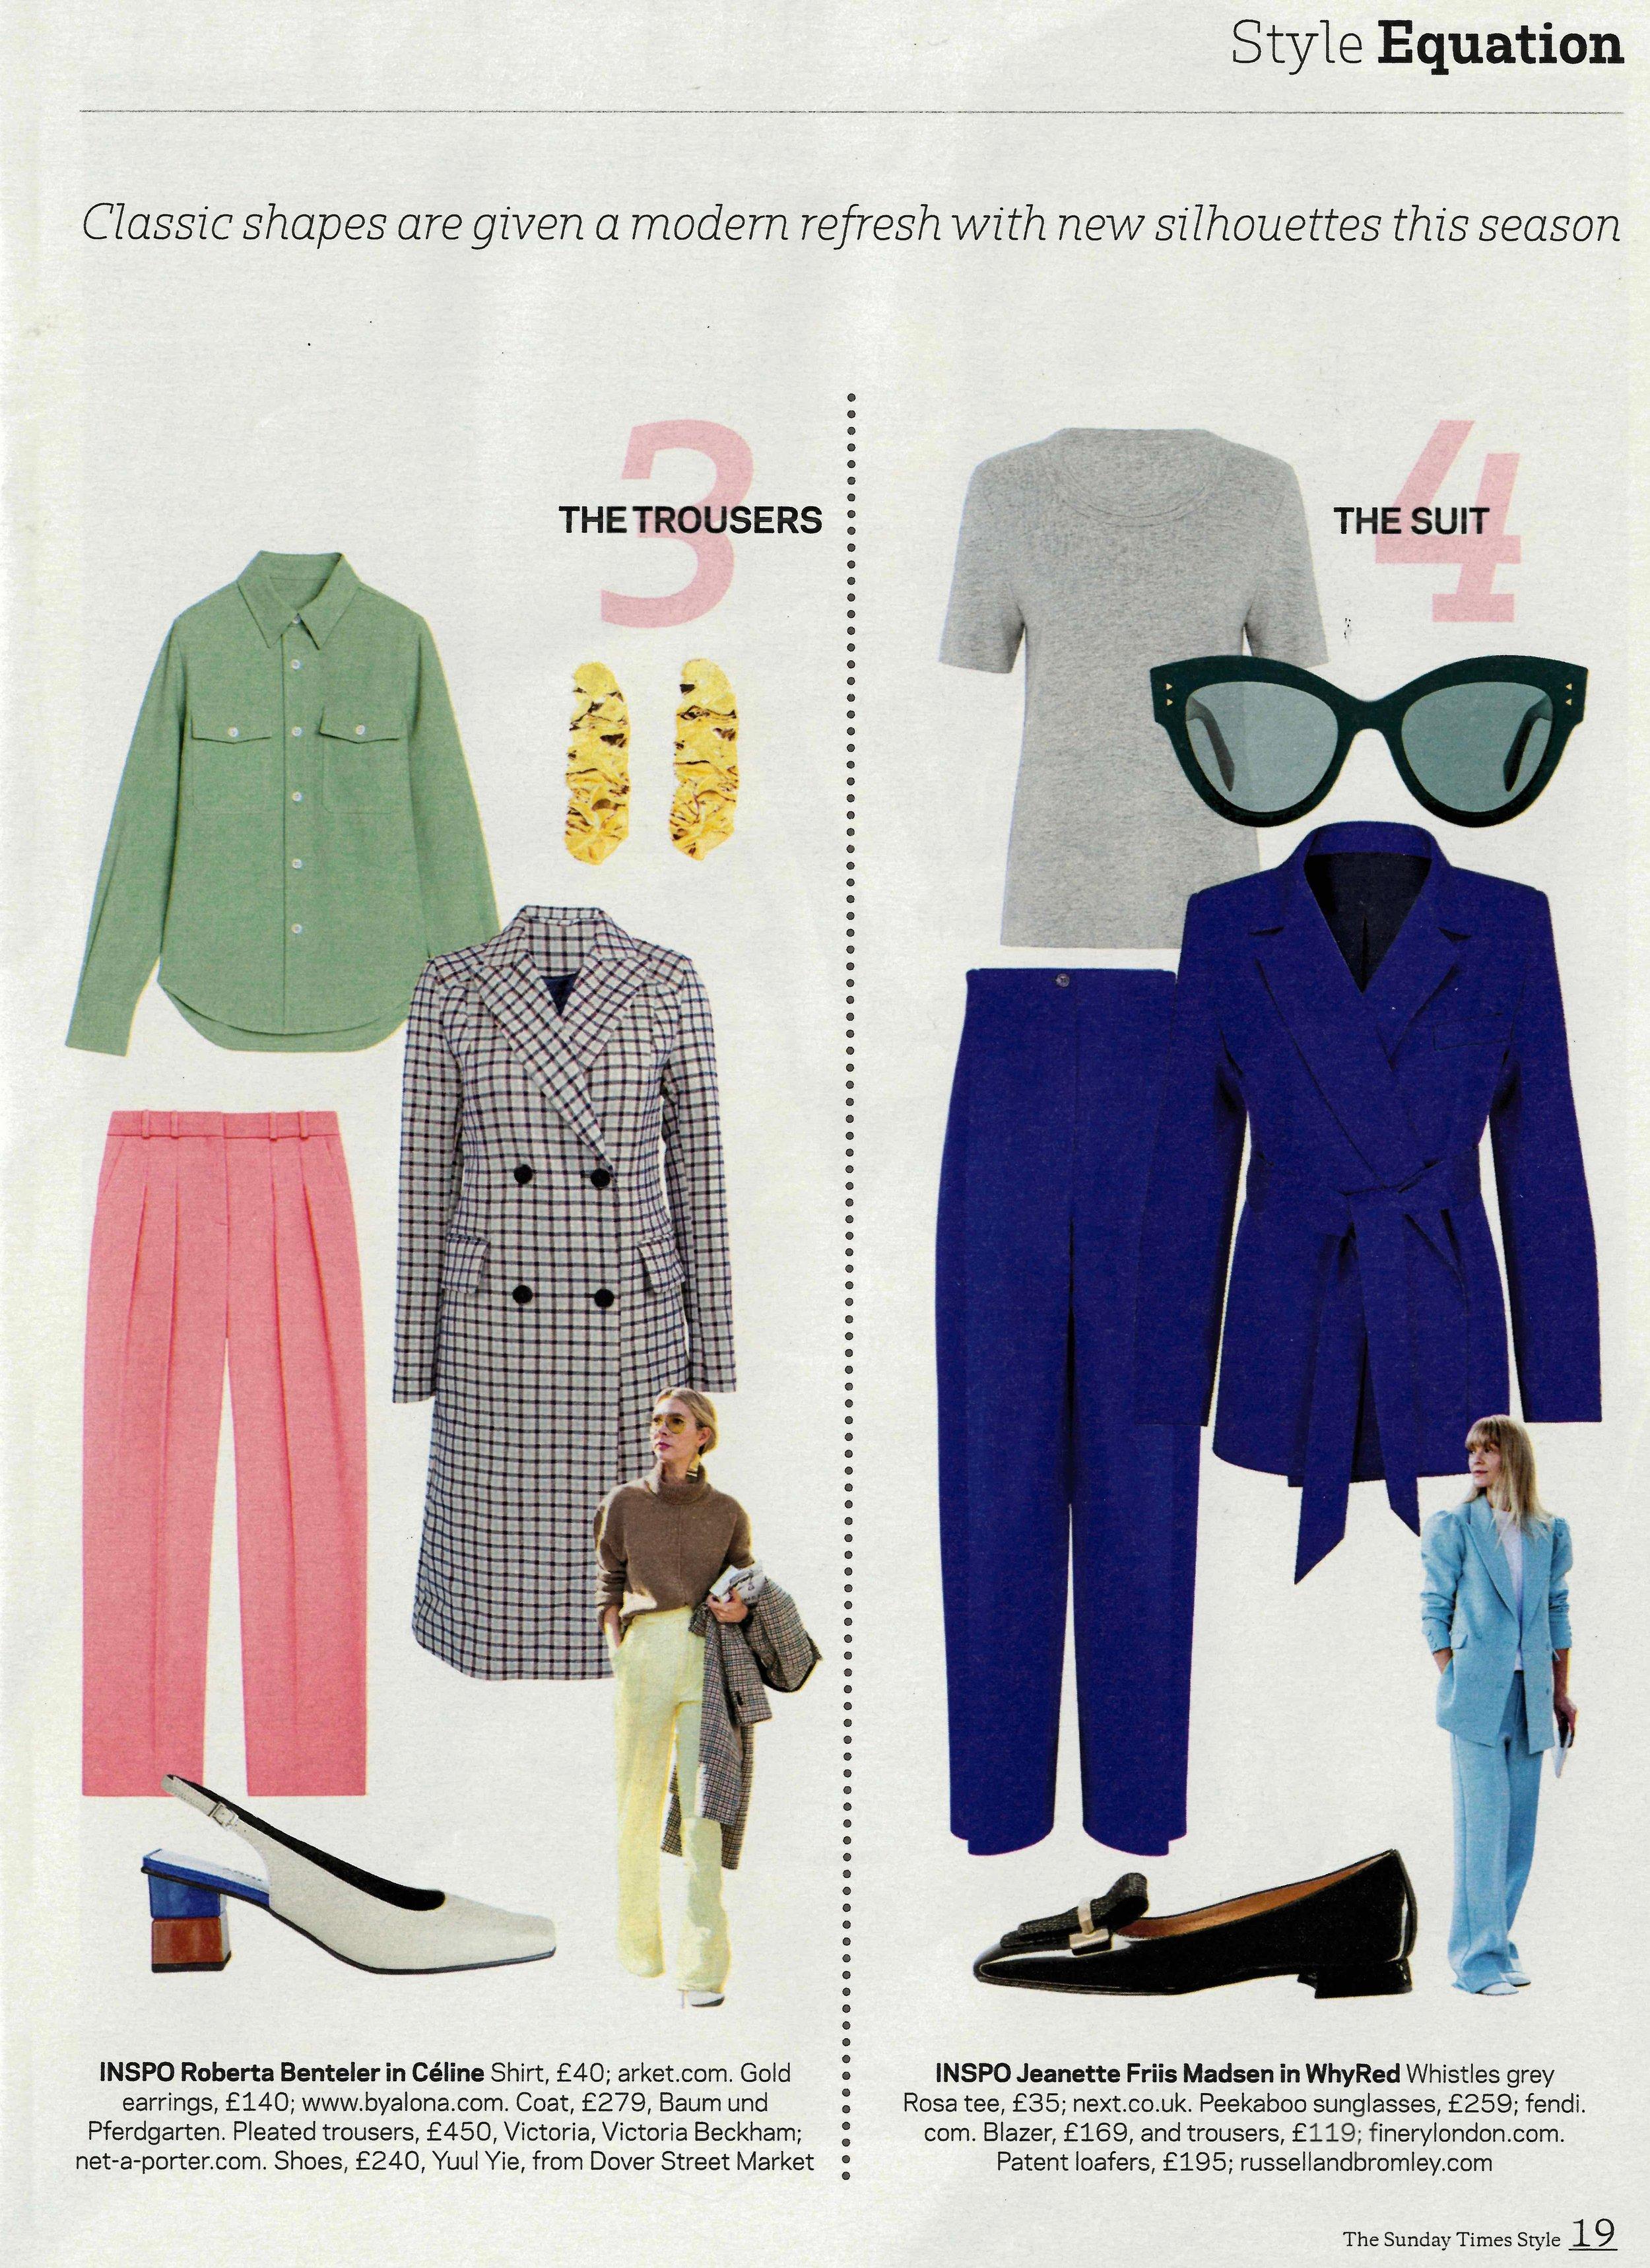 15.04.18 Sunday Times Style  - 1 2.jpg